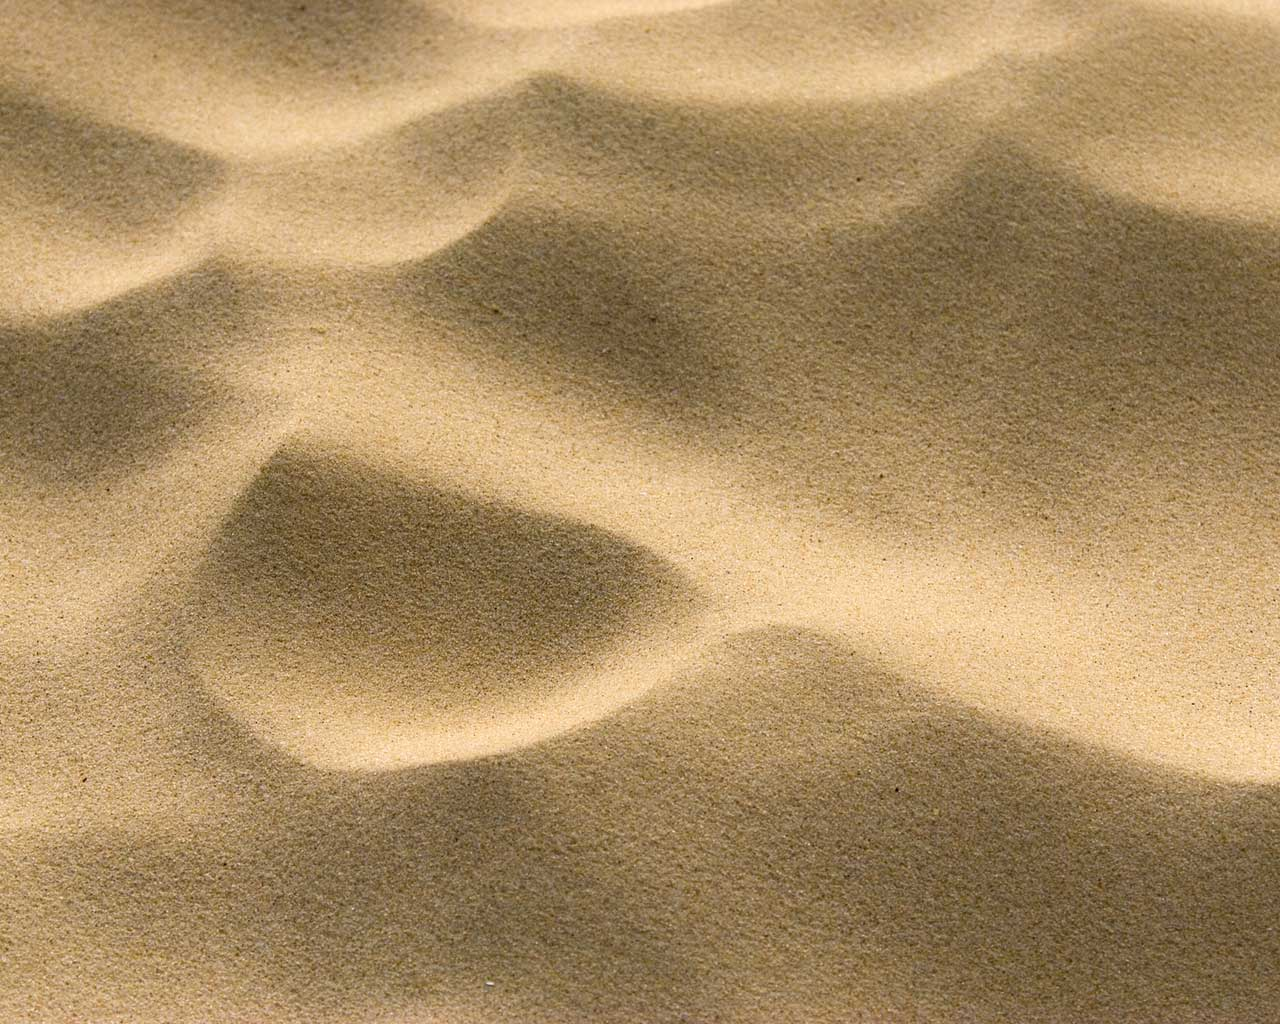 Sand Dunes Soft Free Images At Clker Com Vector Clip Art Online